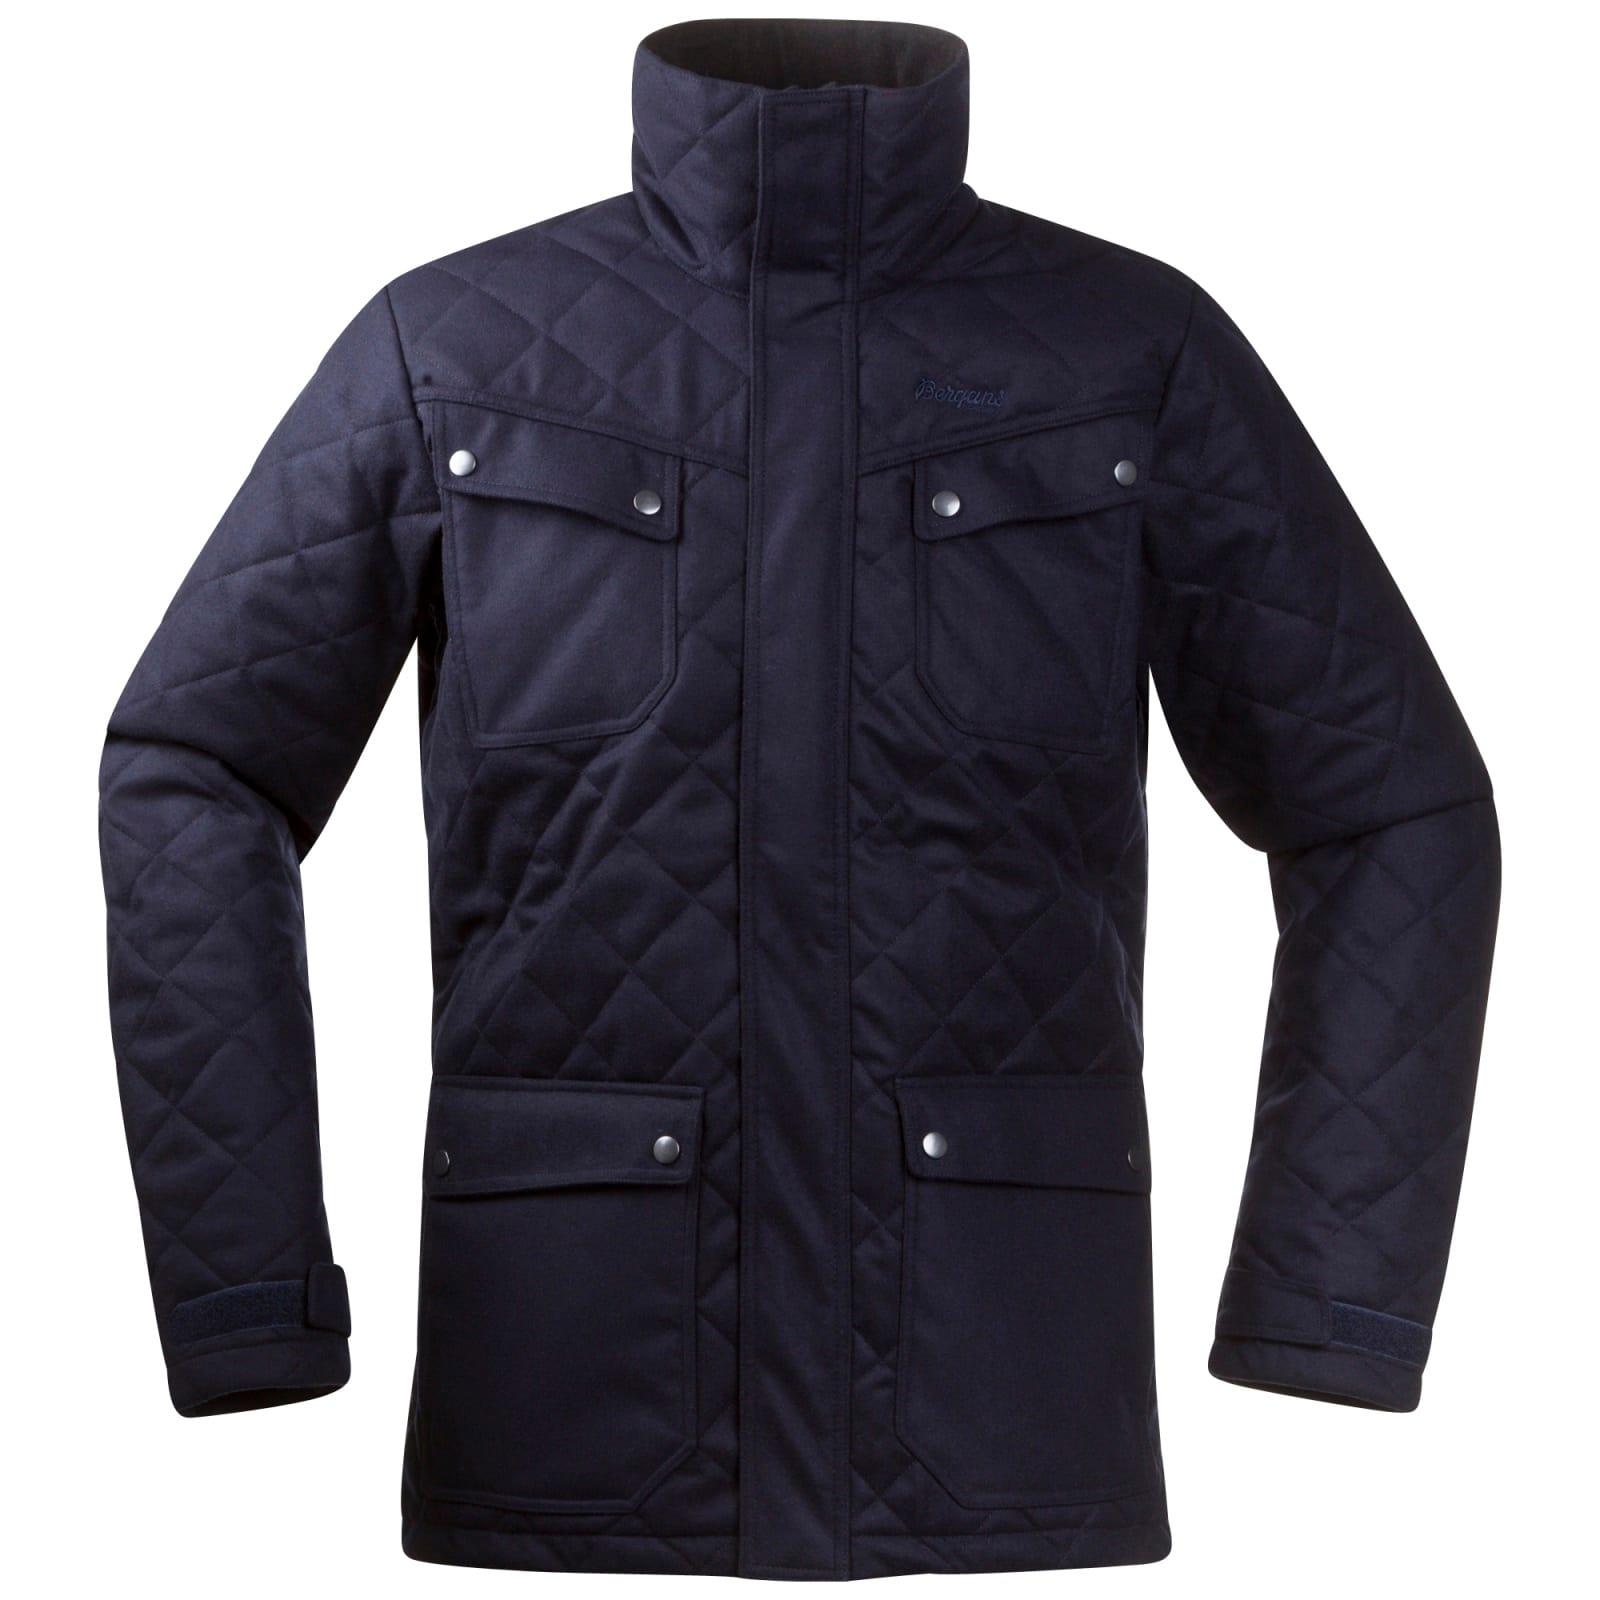 3b2410e6d Røros Insulated Jacket